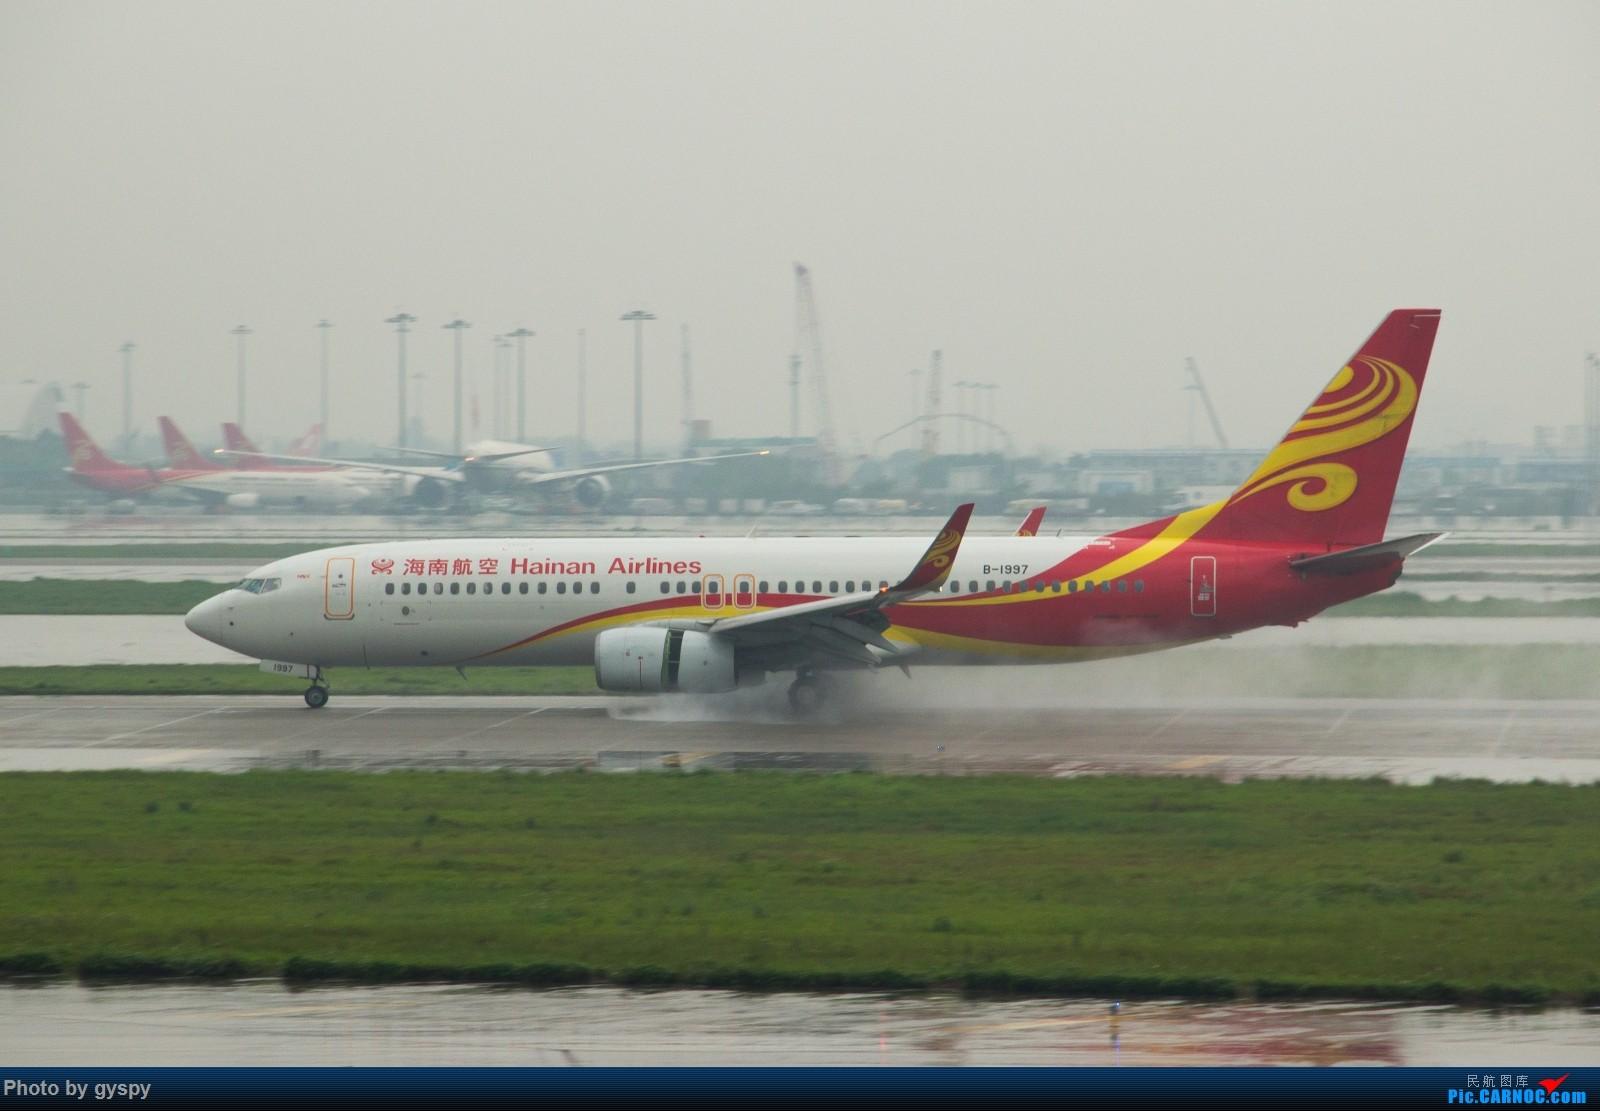 Re:[原创]白云戏水 画质已下线 BOEING 737-800 B-1997 中国广州白云国际机场